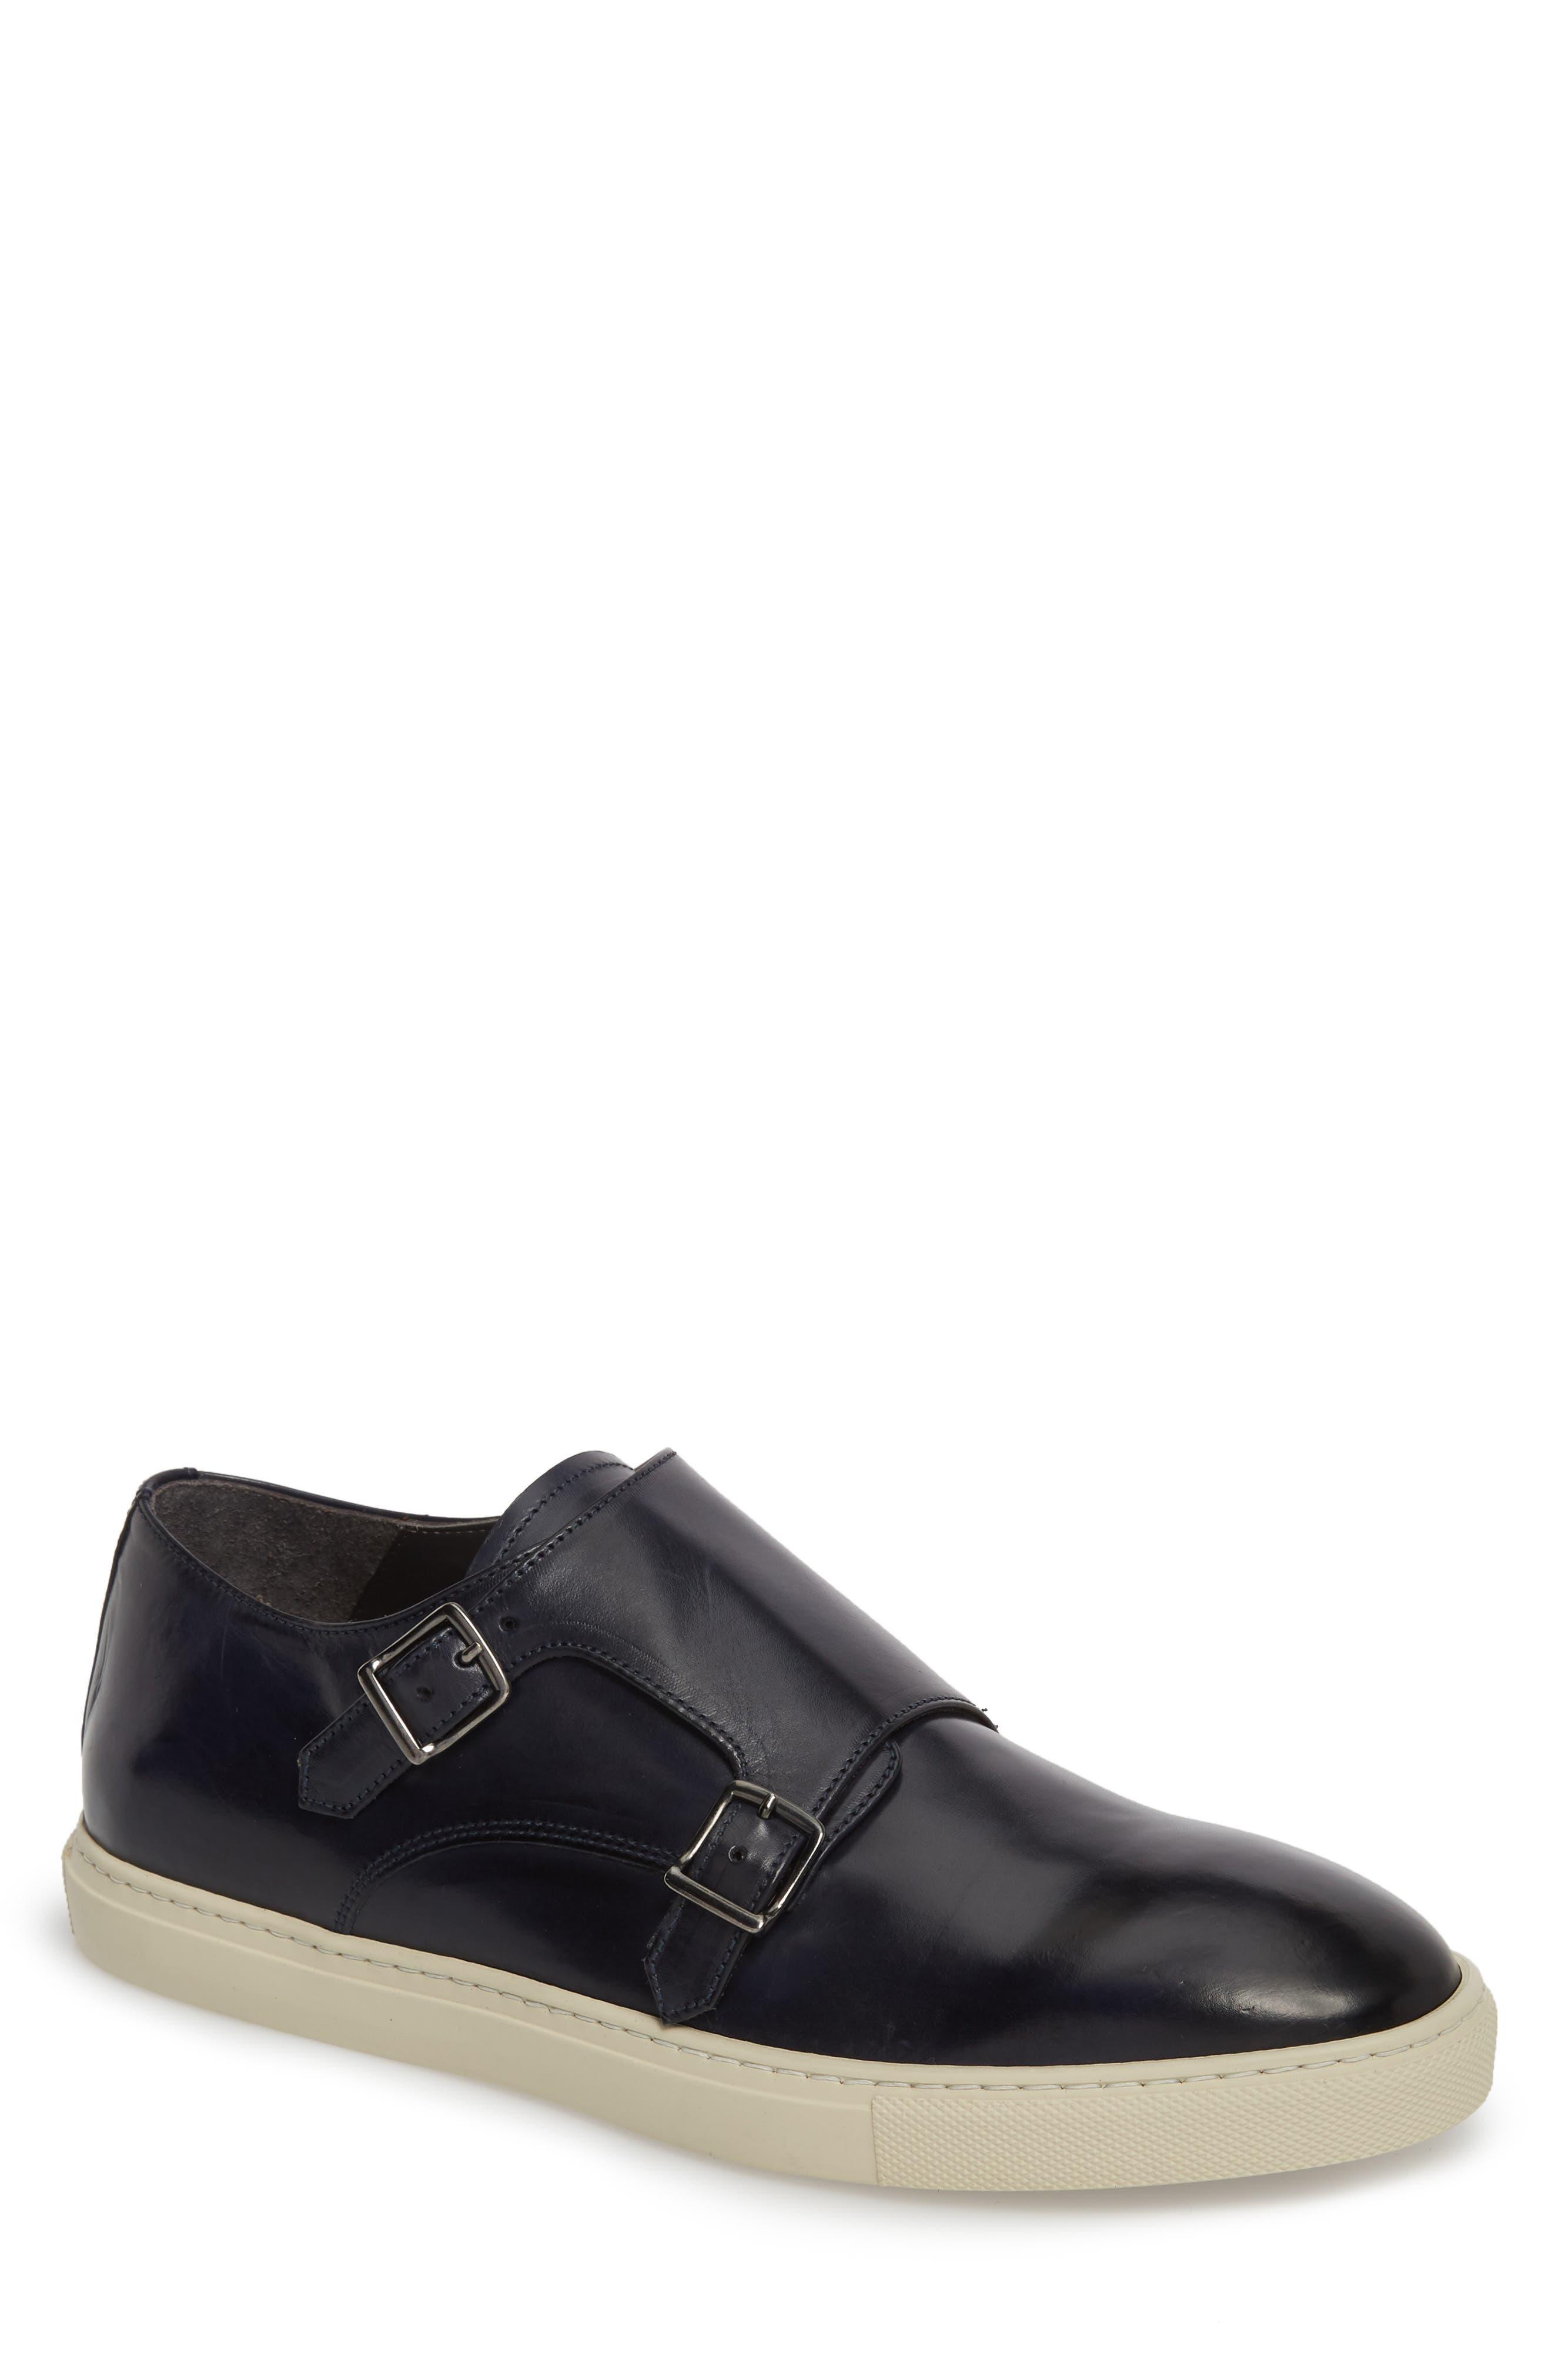 Gildden Double Monk Strap Sneaker,                             Main thumbnail 1, color,                             Diver Blue Marine Leather